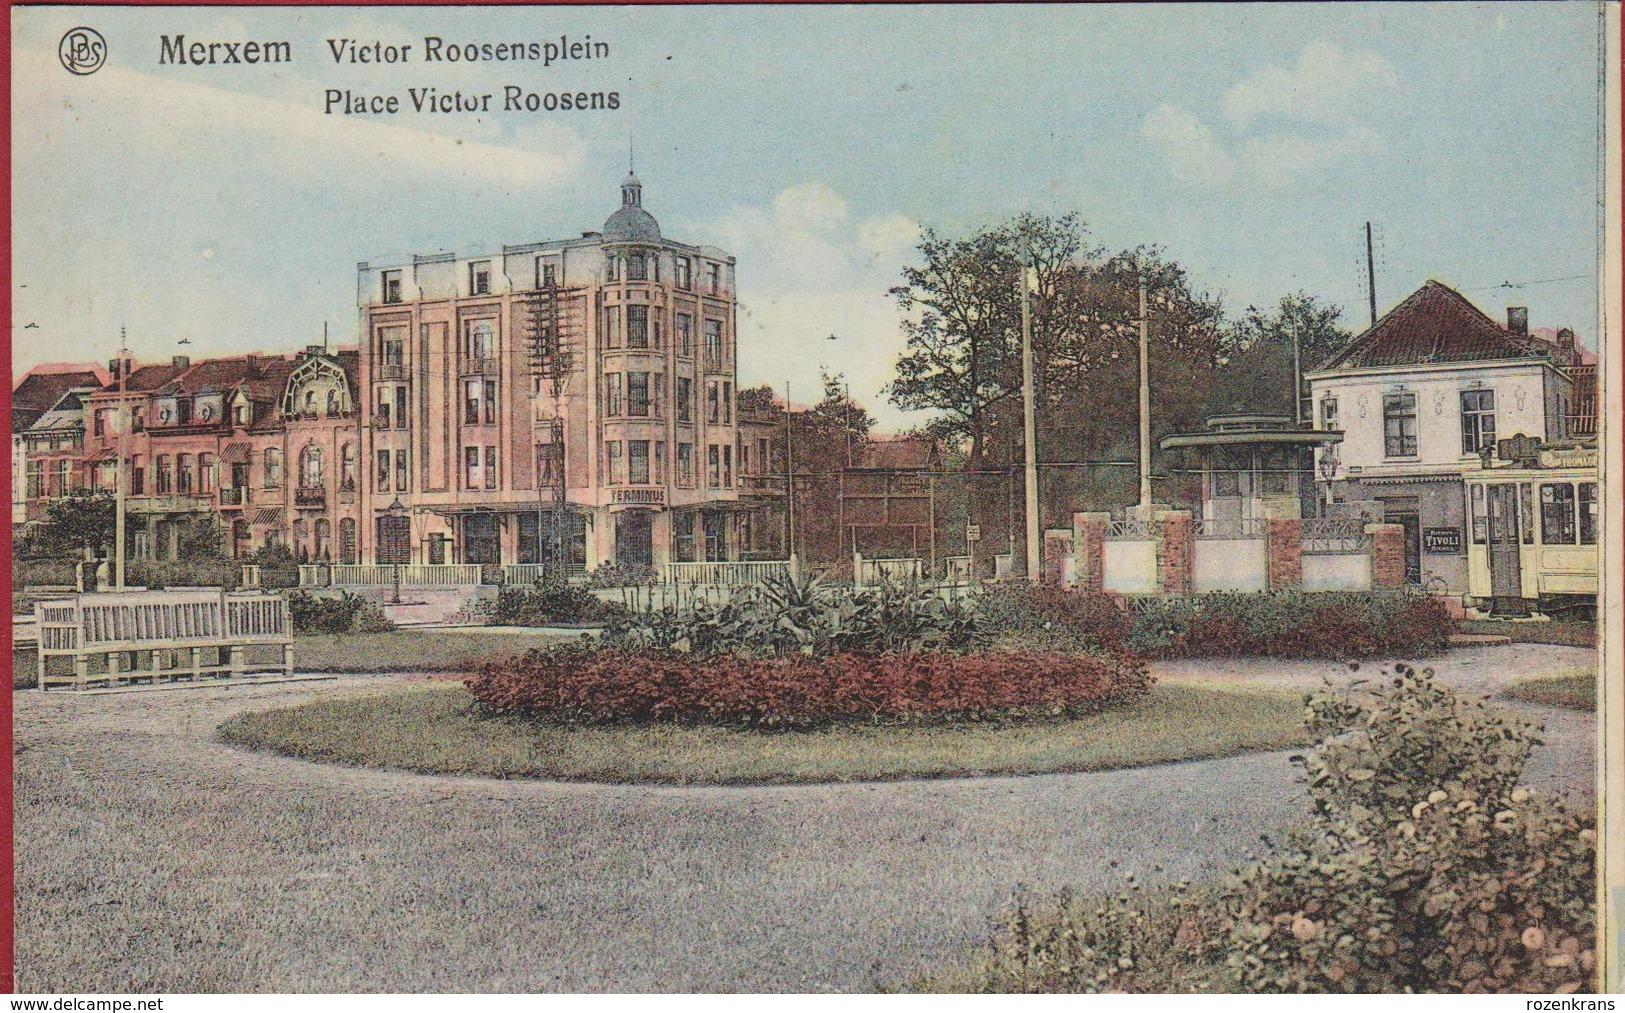 Merksem Victor Roosensplein Place Victor Roosens Tram (In Zeer Goede Staat) - Antwerpen